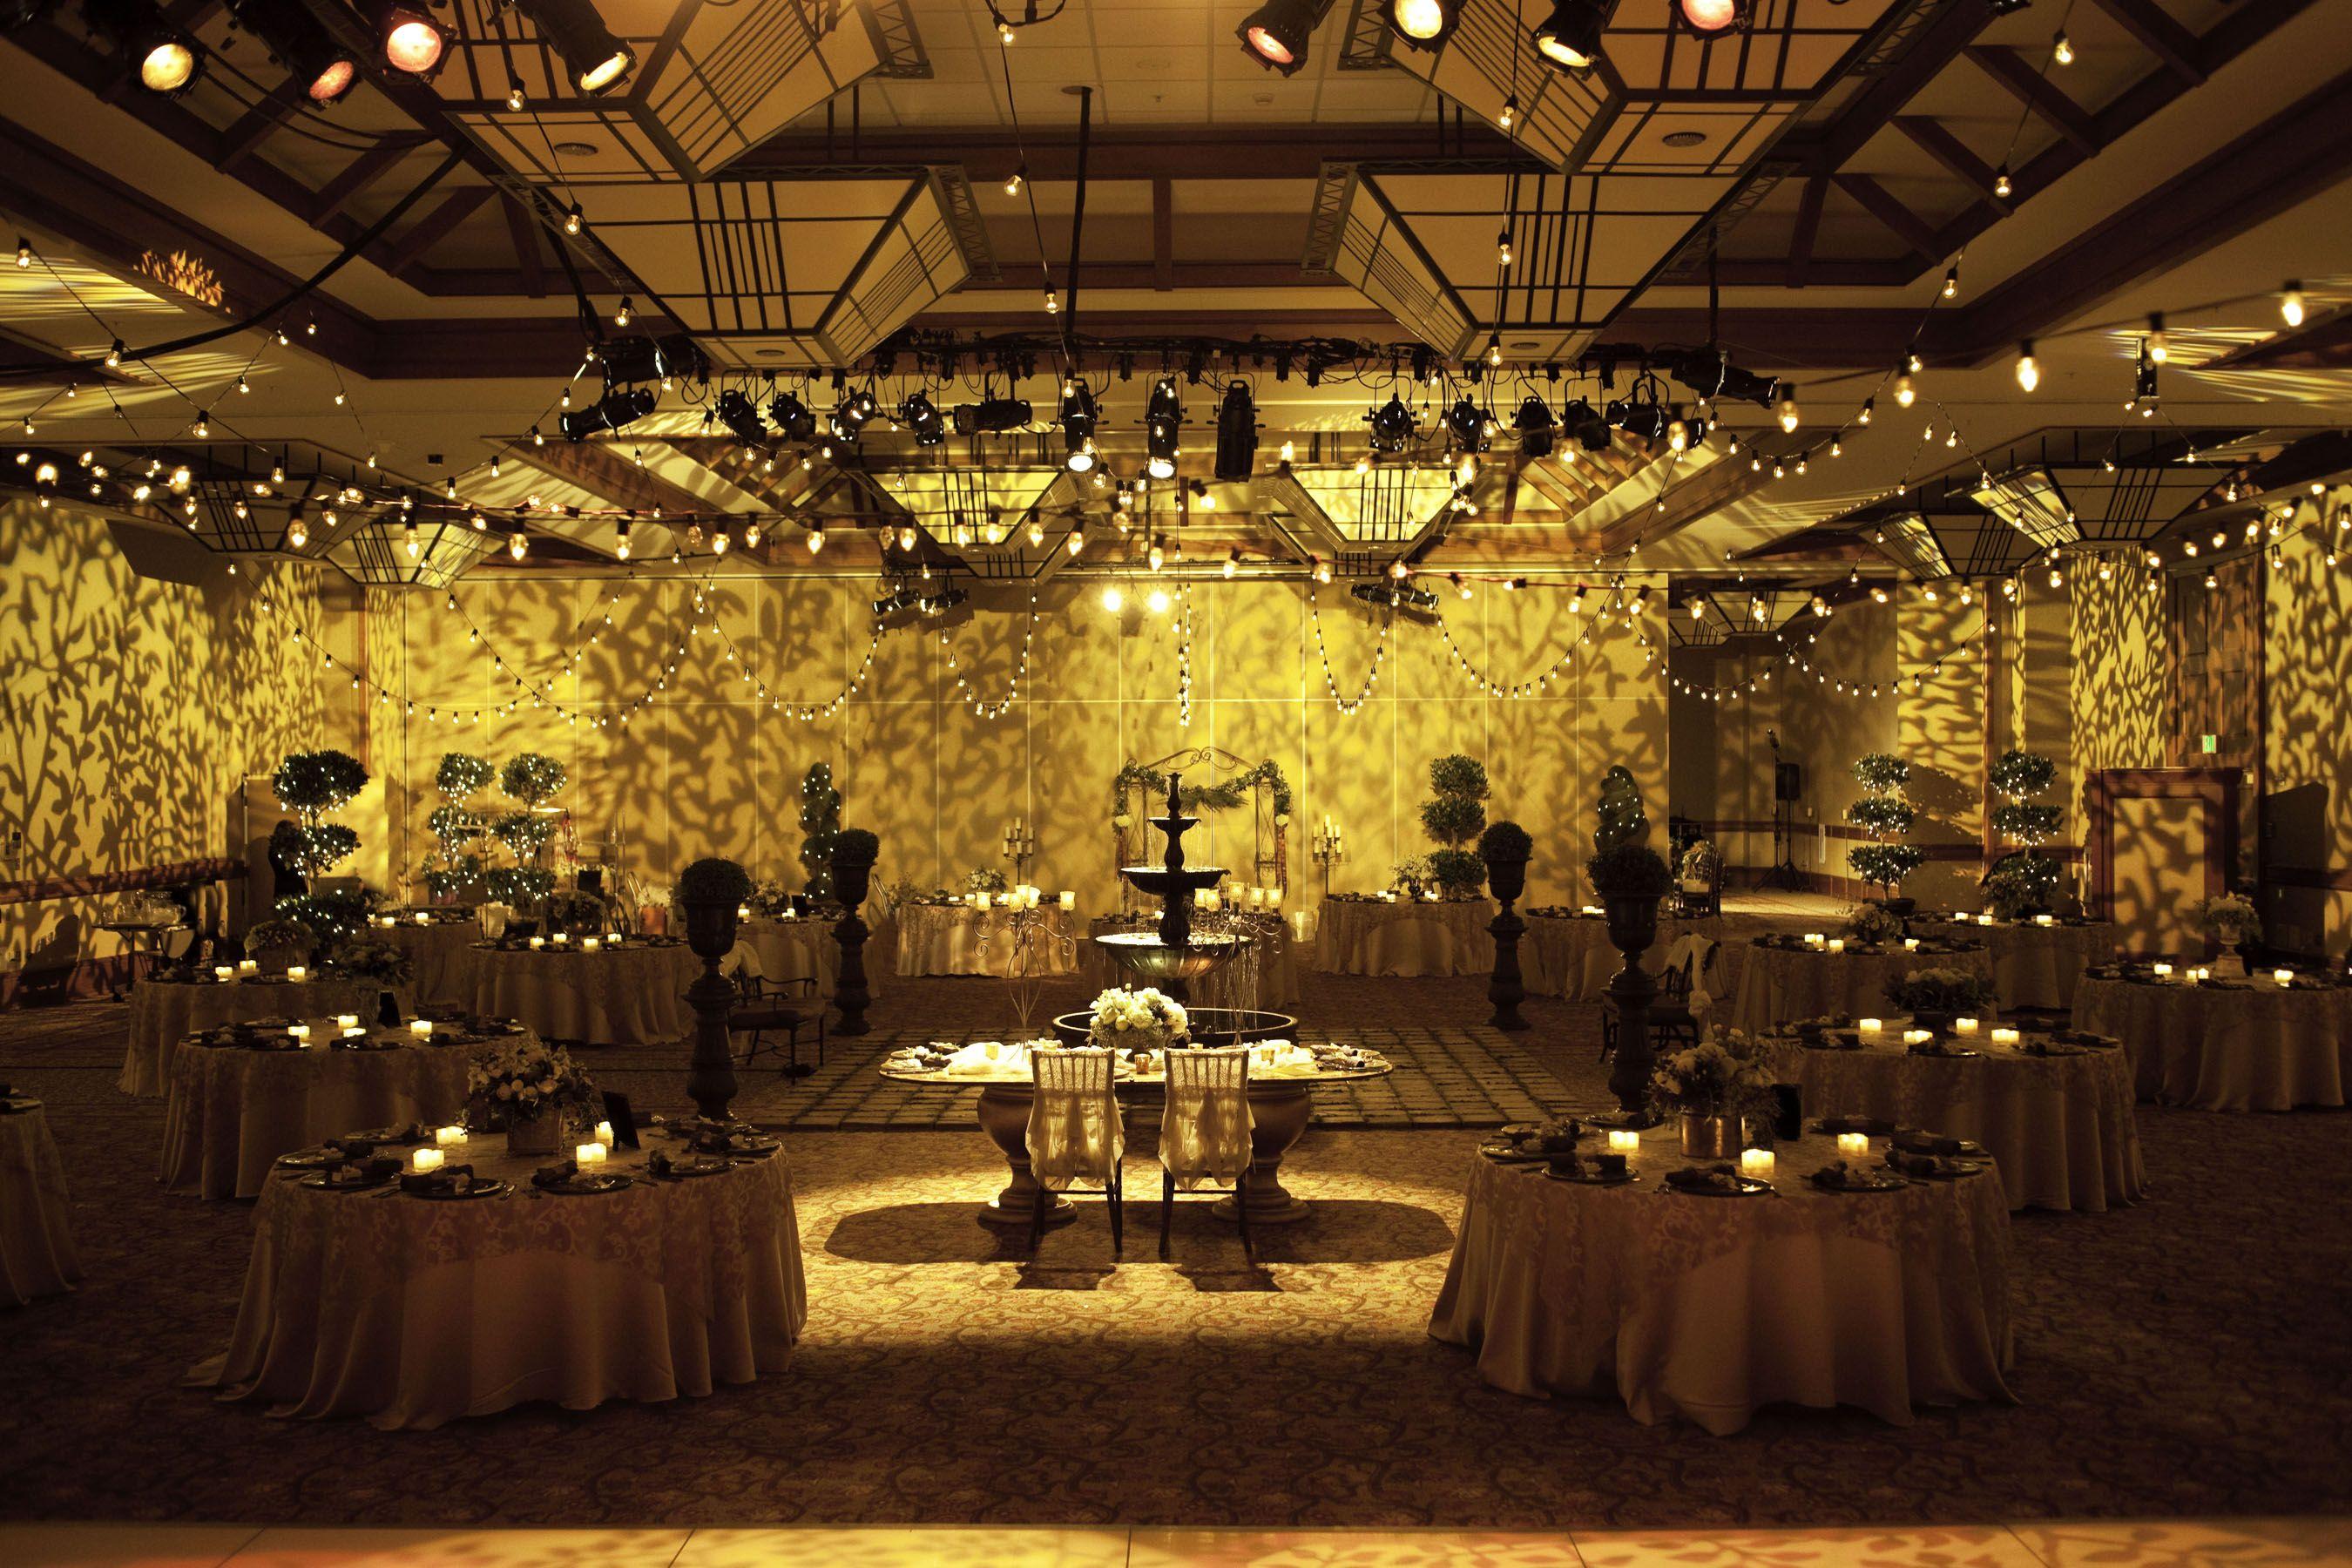 wedding receptions sacramento ca%0A    best Event Decor Ideas images on Pinterest   Birthdays  Events and My  love